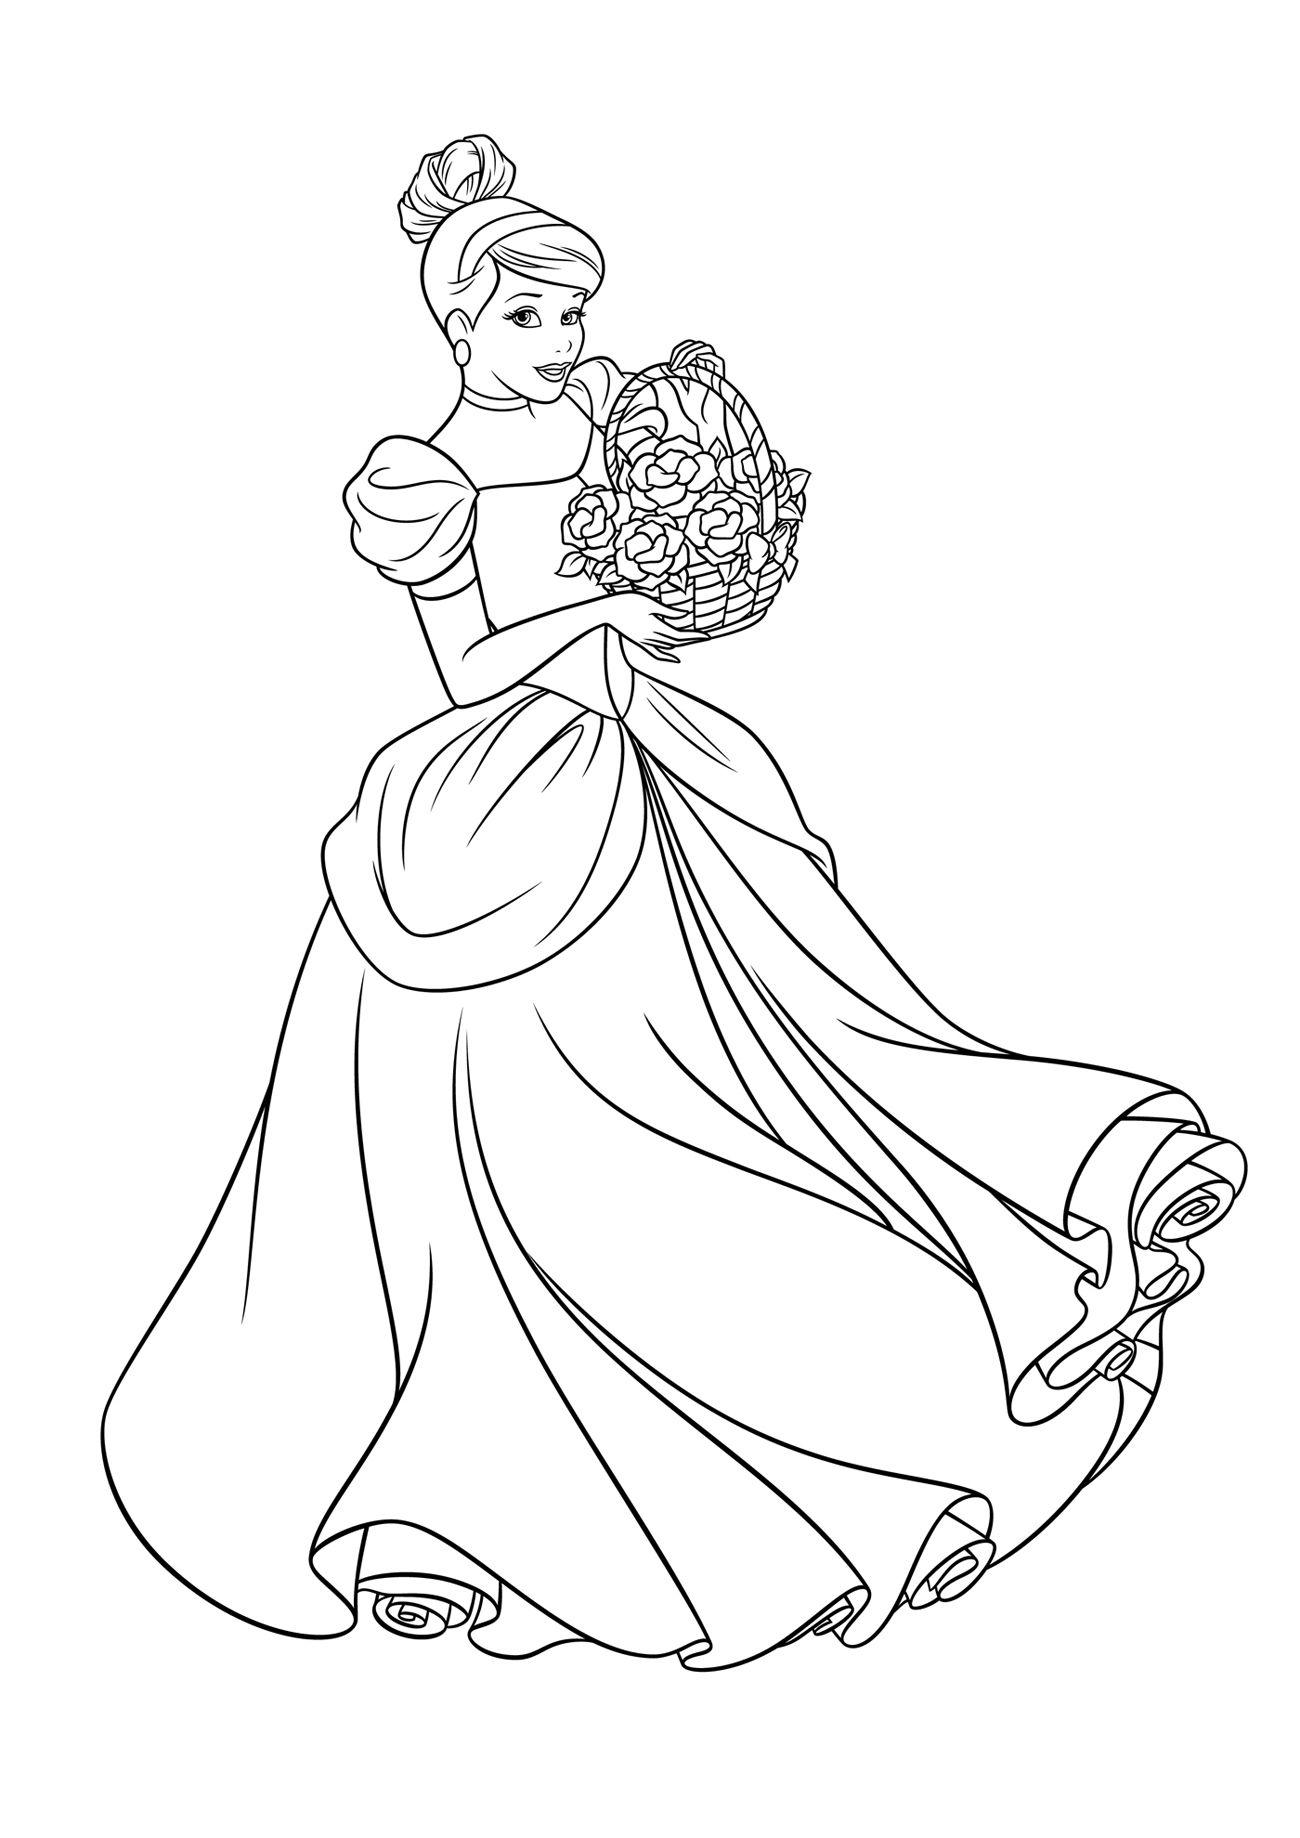 Pin by NAL NAL on Cinderella | Pinterest | Coloring books, Disney ...